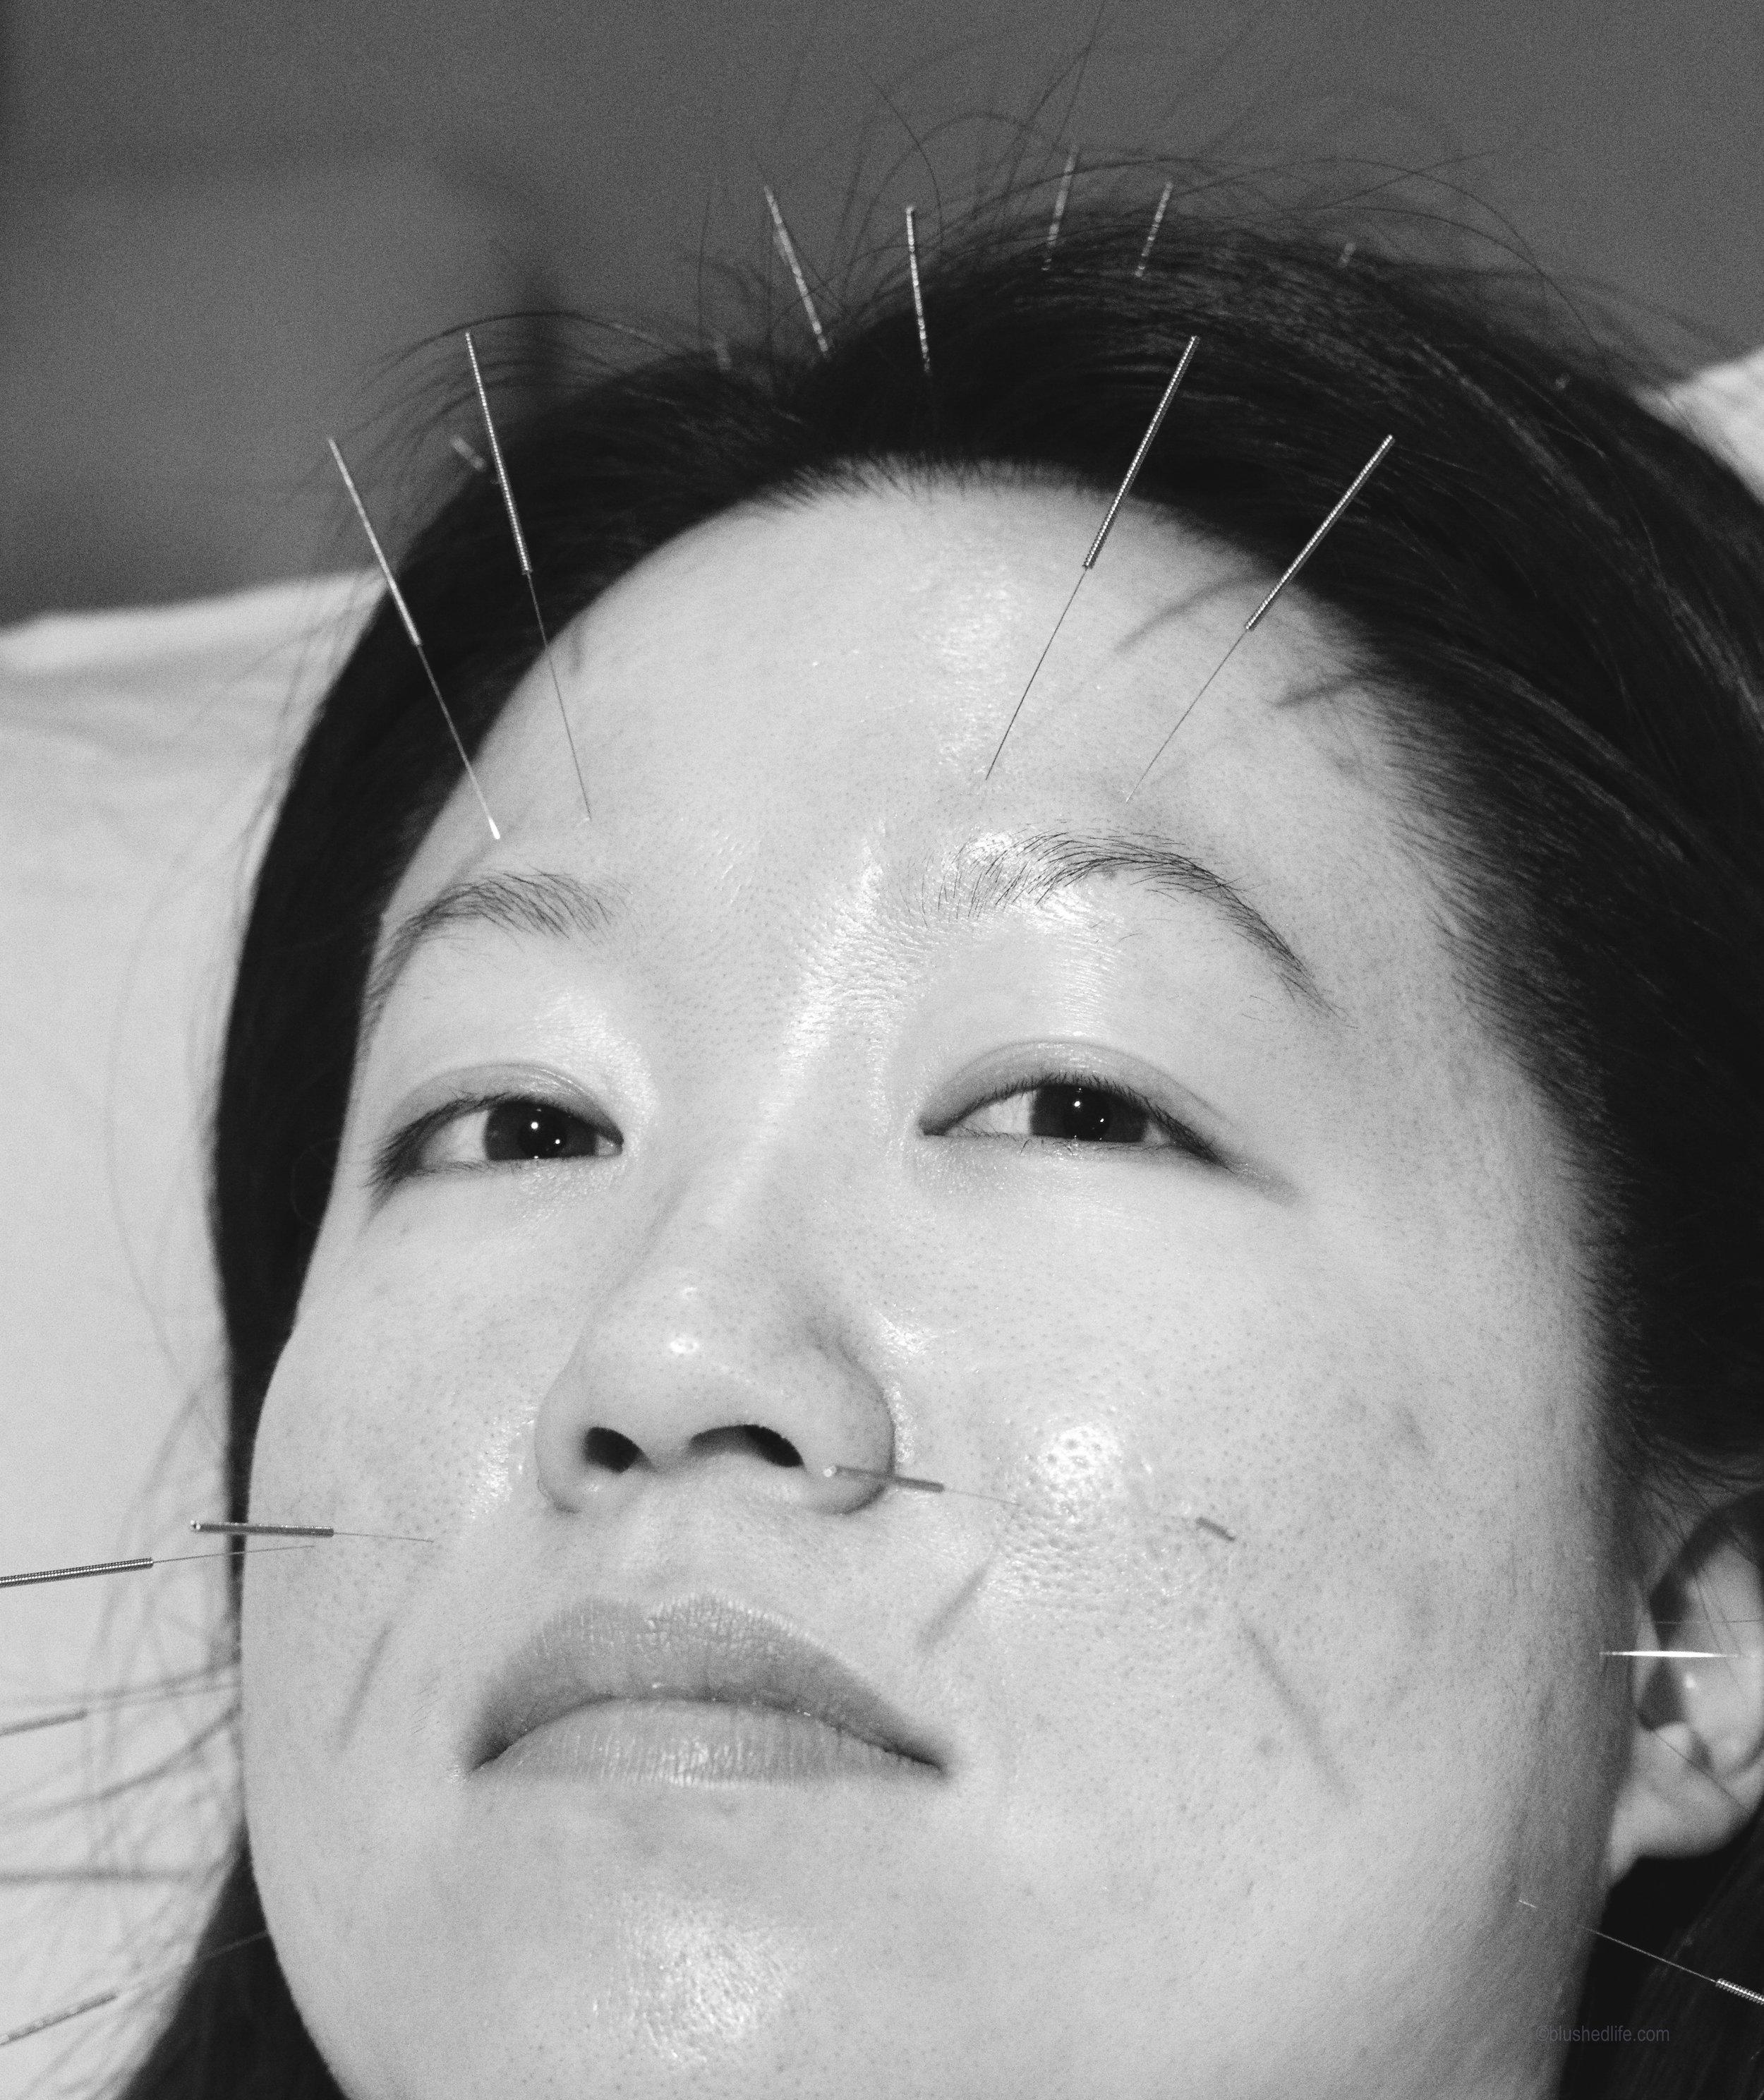 facial acupuncture acne pores_DSC07486-2-2.jpg